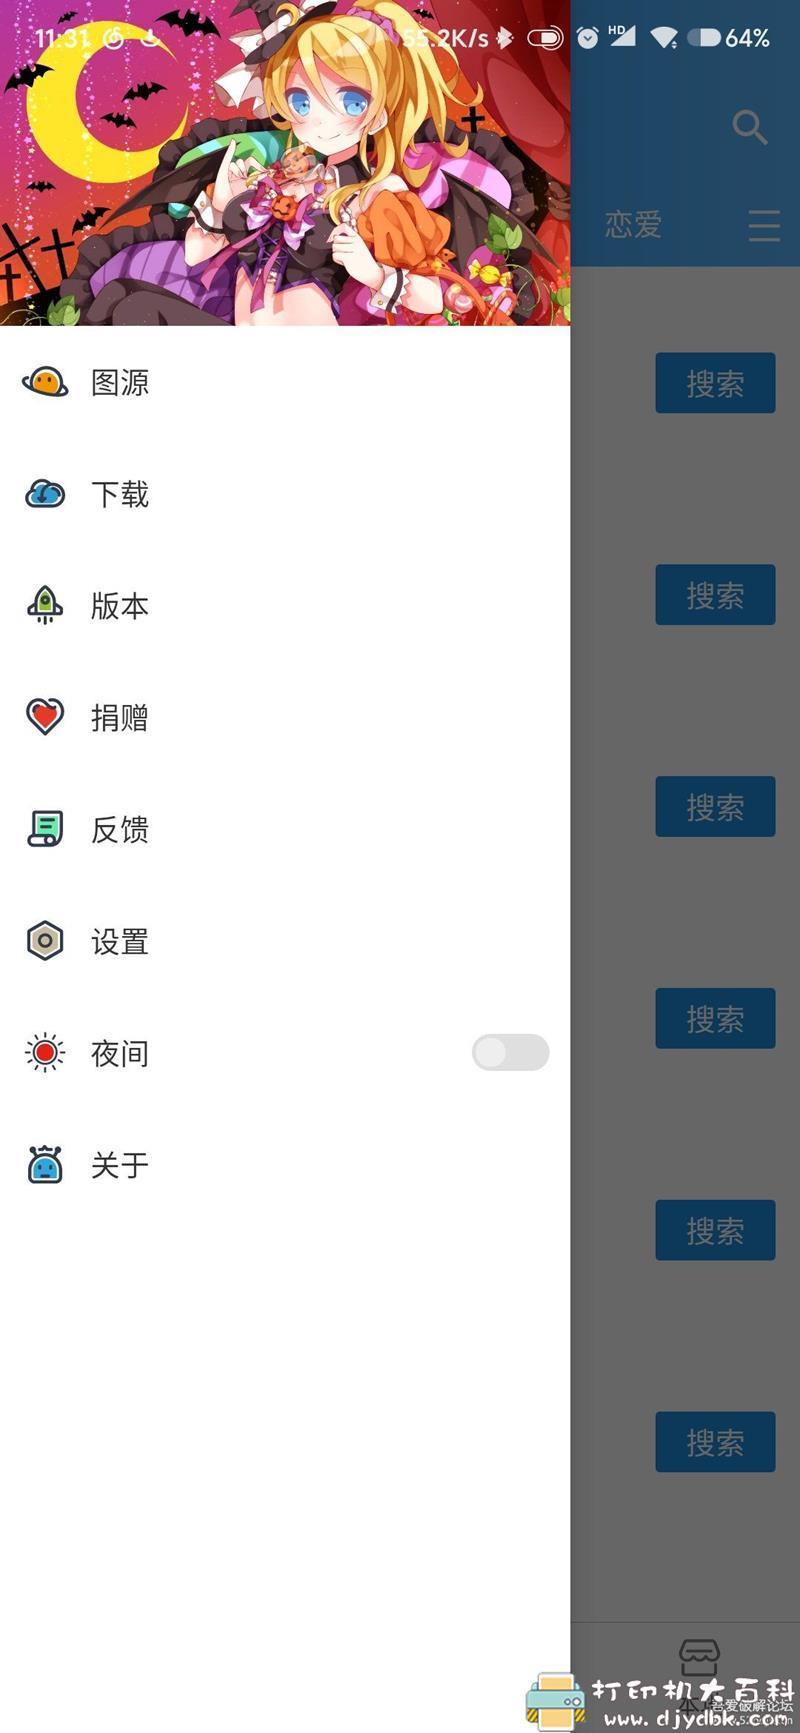 [Android]两个阅读软件,一个漫画软件推荐,内含大量阅读书源图片 No.7